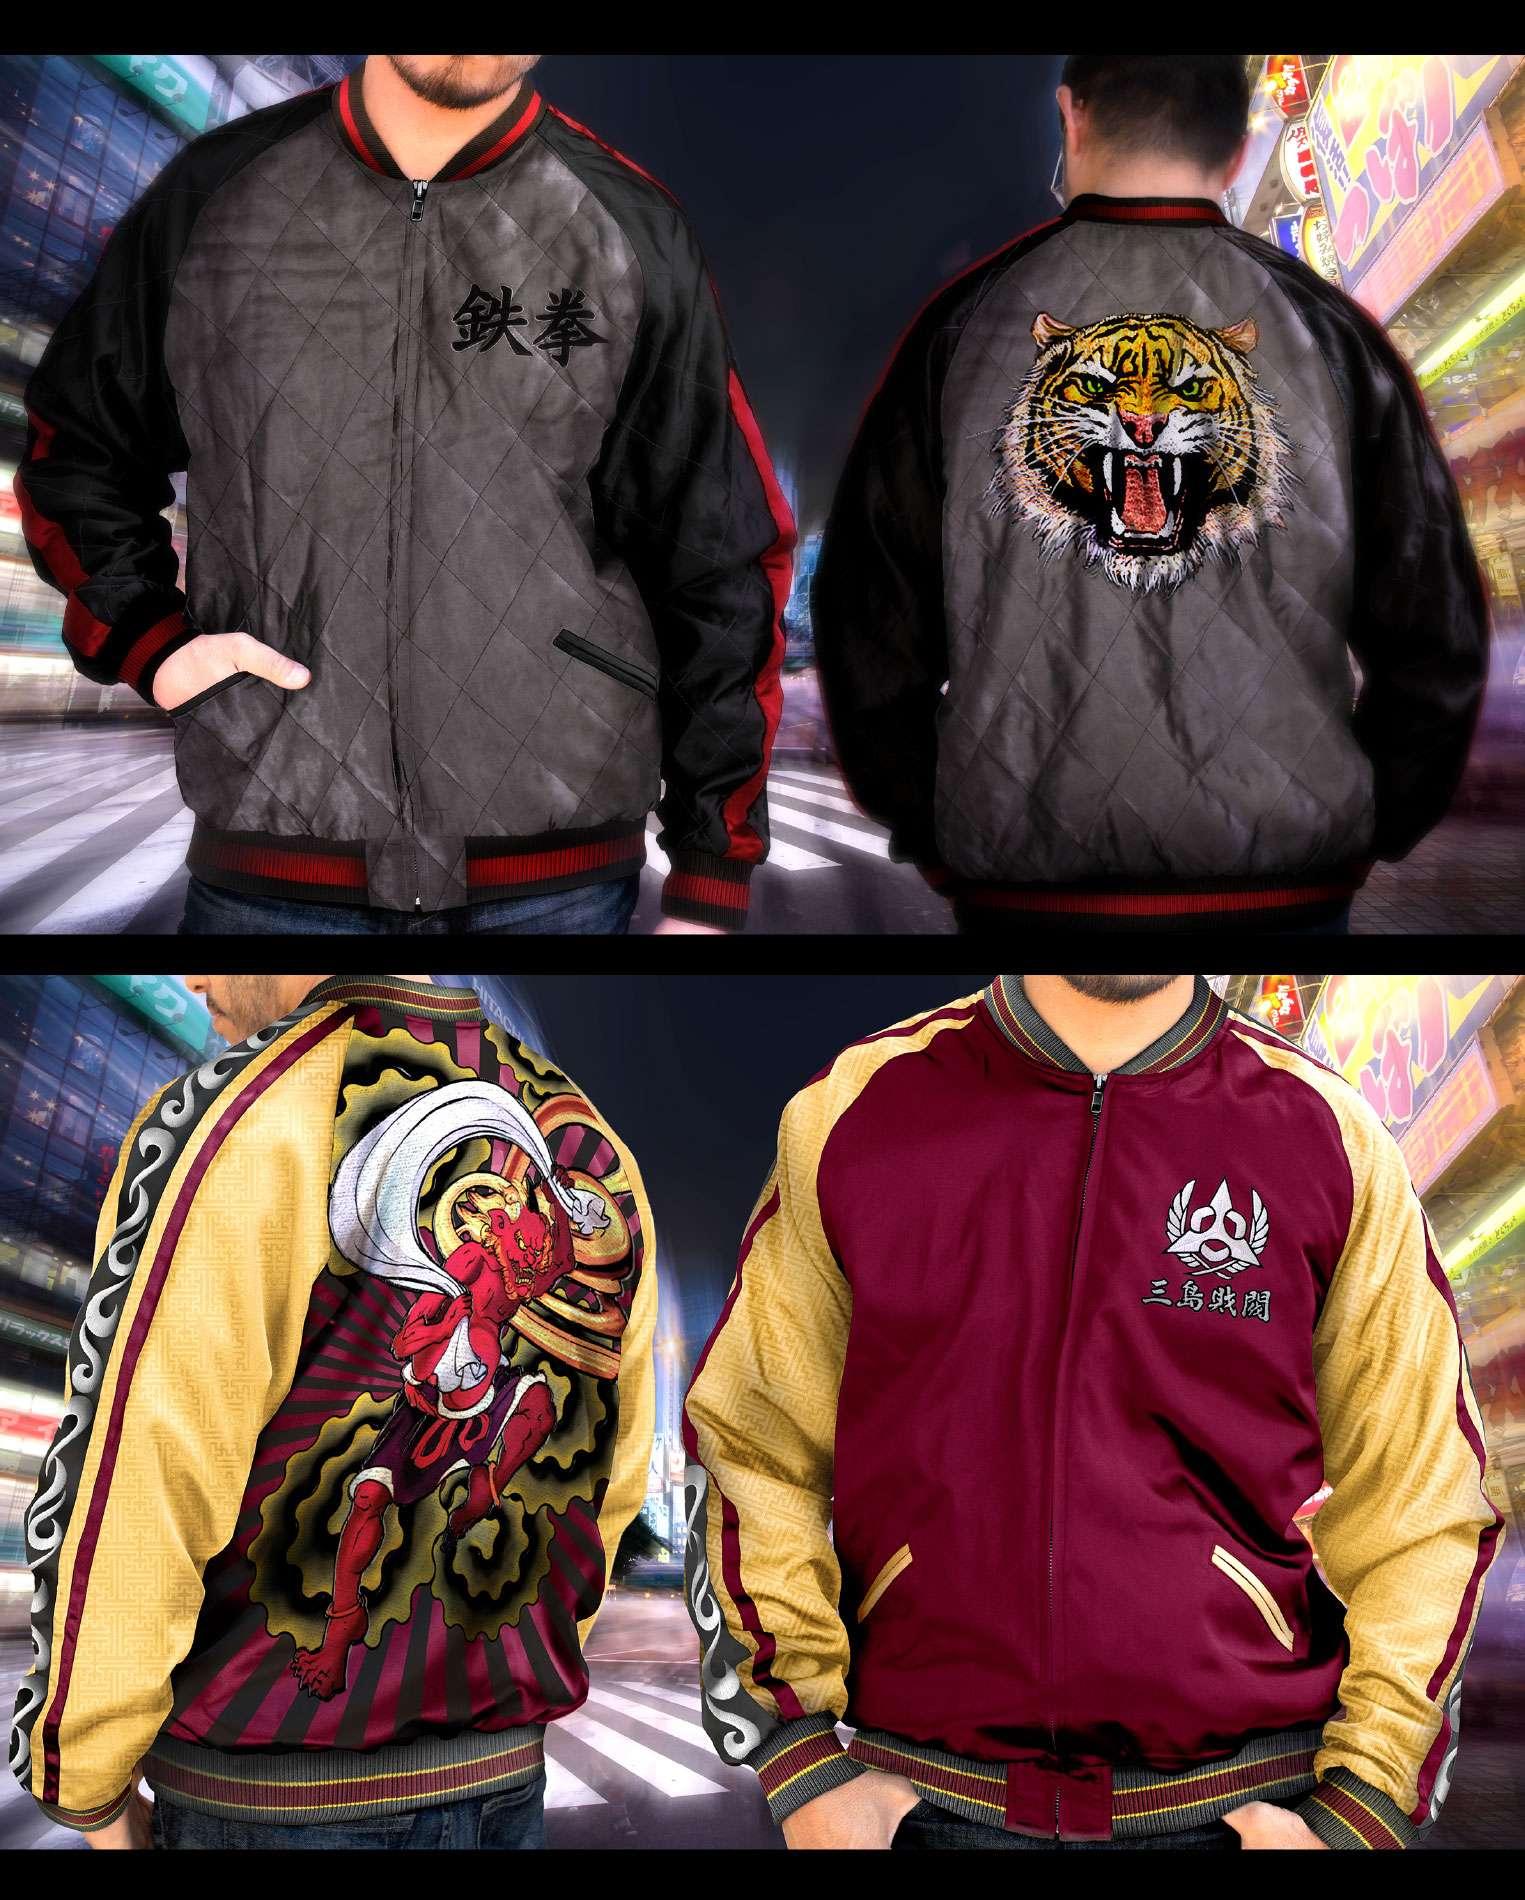 20160927_tekken-7_sukajan-jacket-announcement_final-espa%c2%a6ol